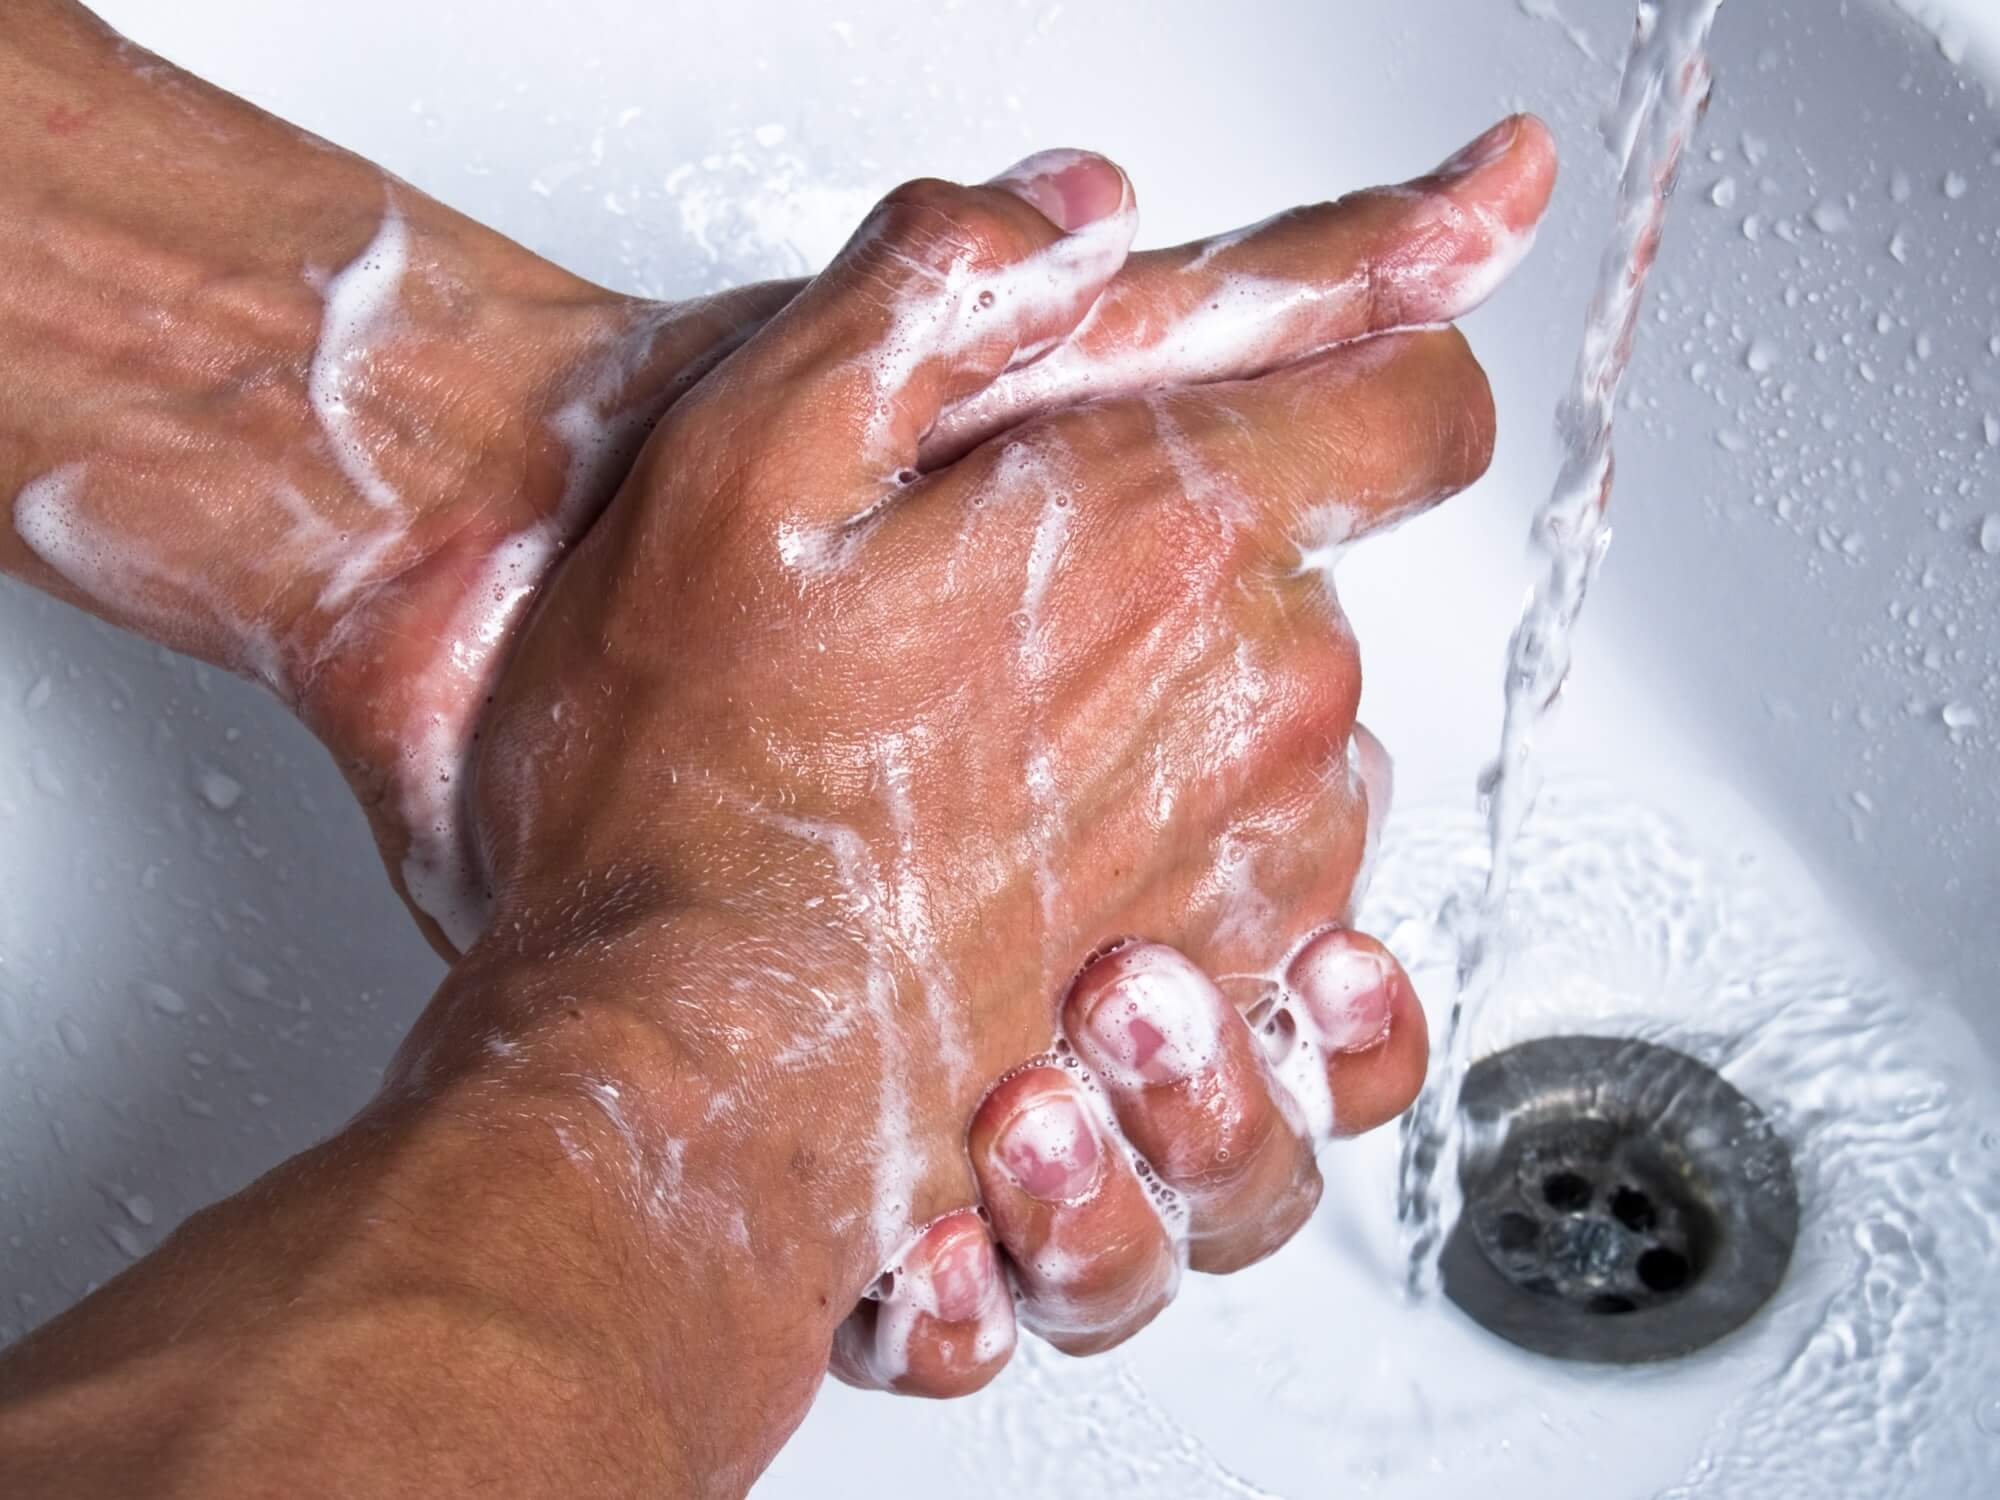 Standardhygiene aktuell – bei unentwegt zirkulierenden resistenten Keimen